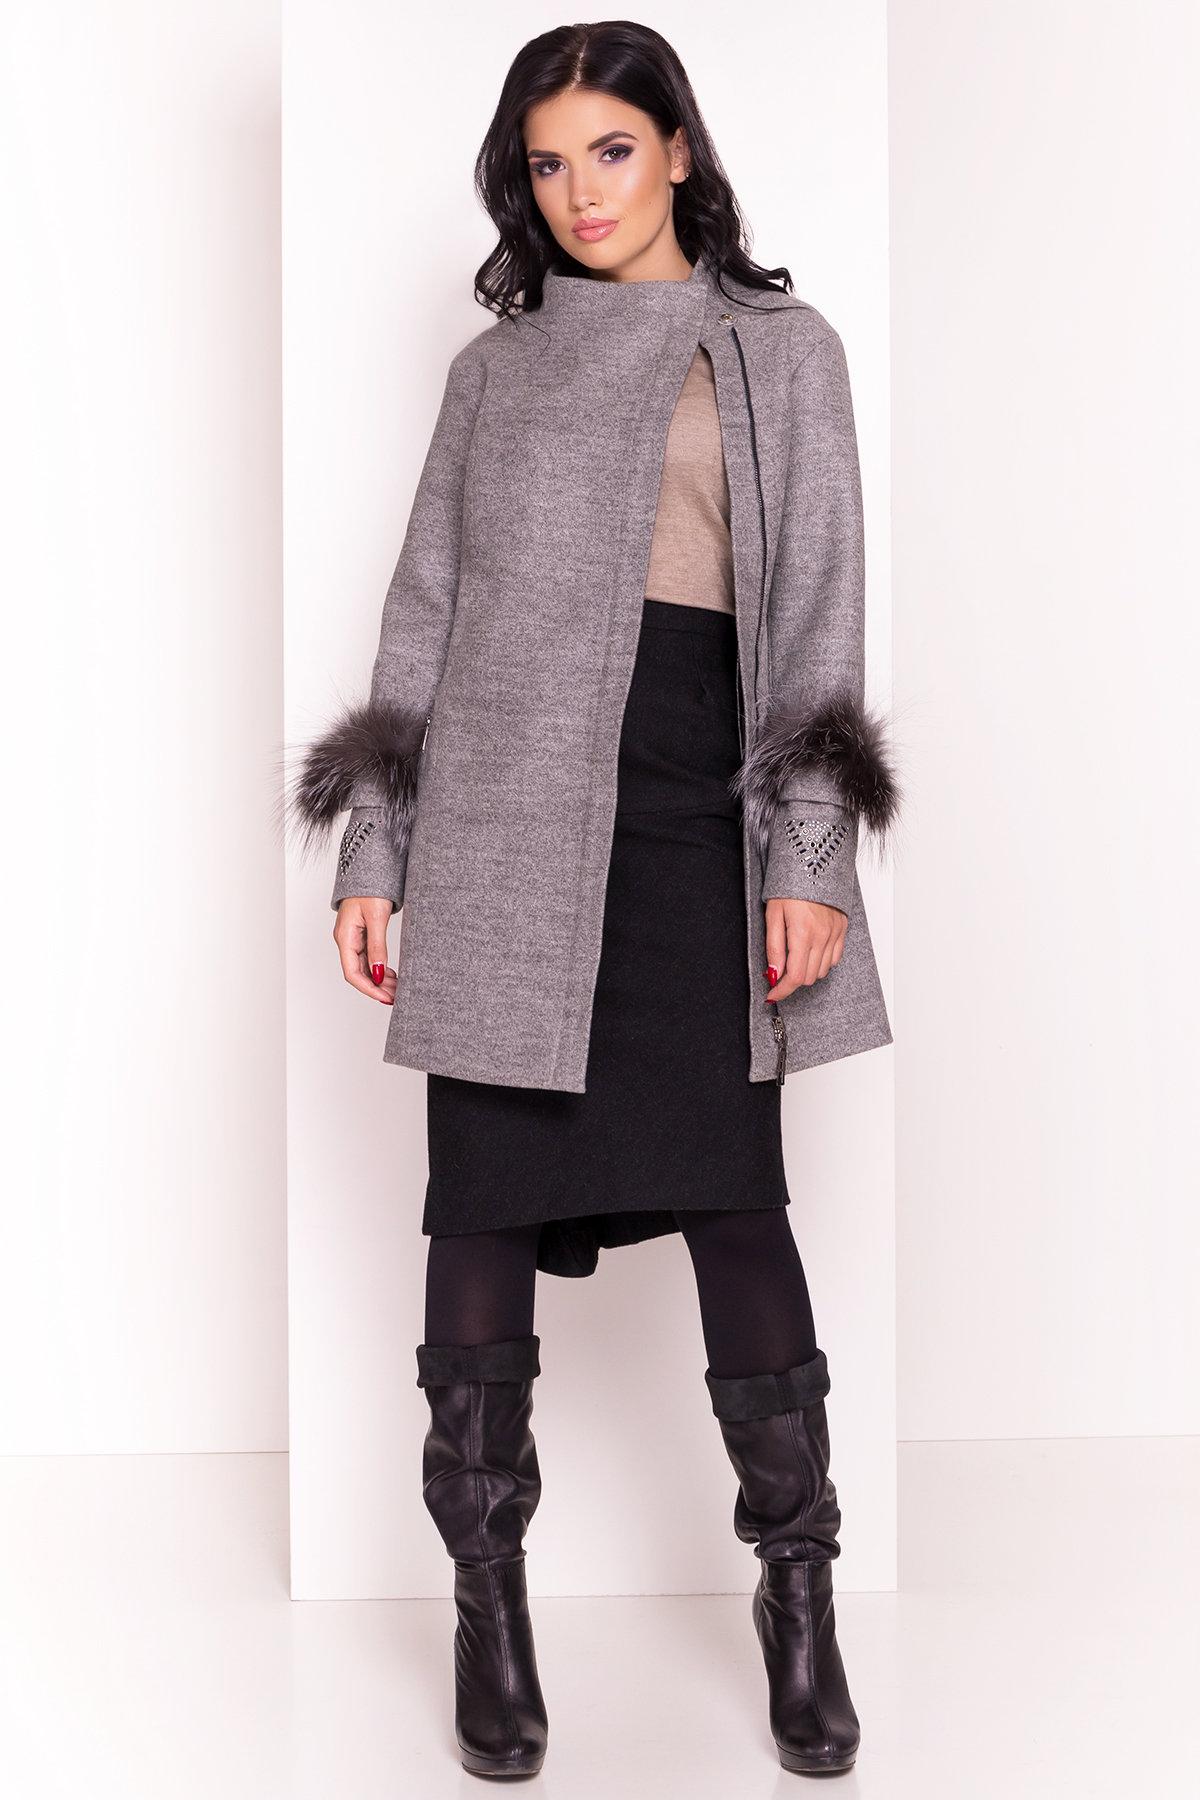 Пальто Лорин 4478 Цвет: Серый Светлый